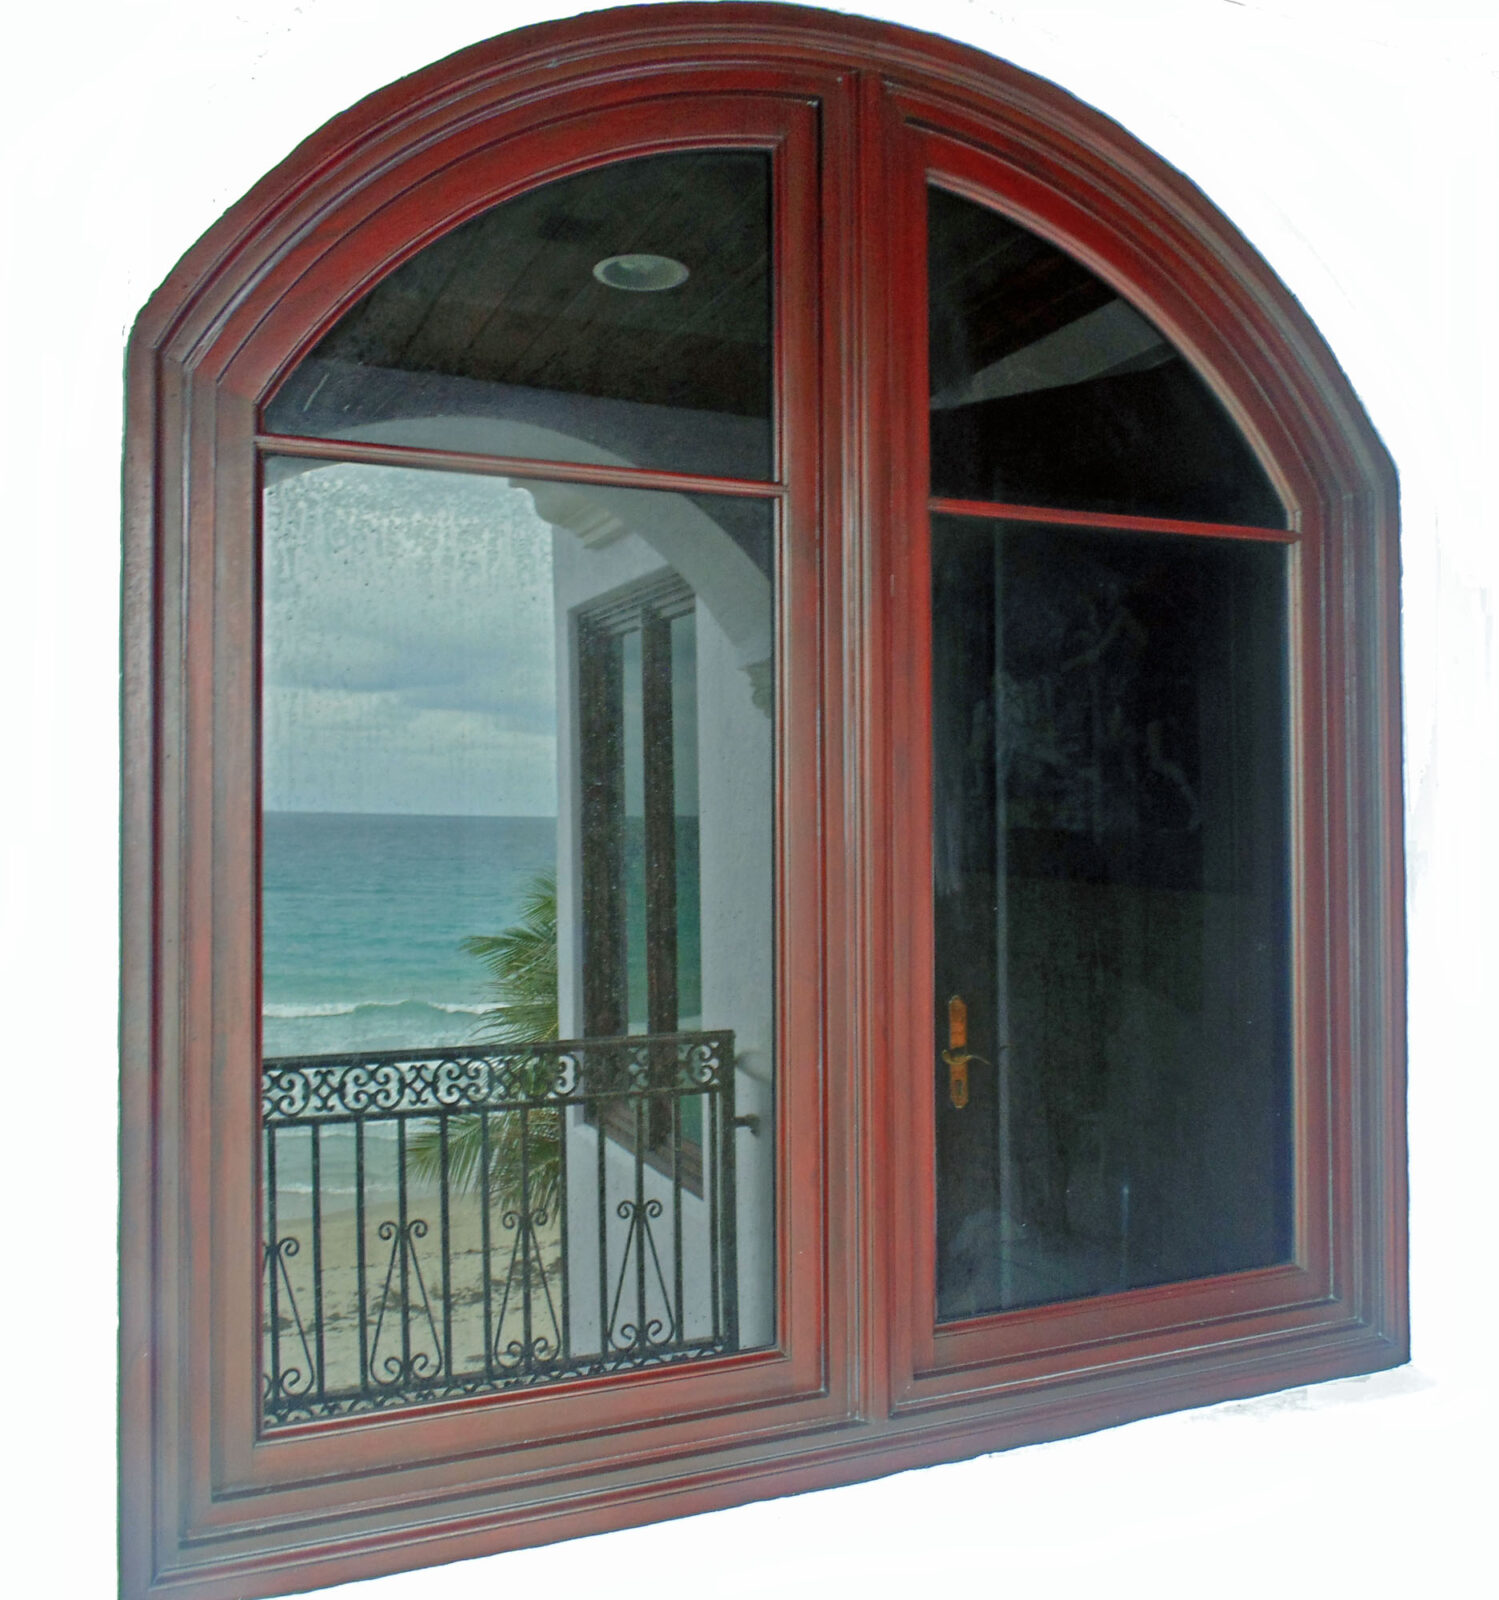 HIGHLAND BEACH FIXED WINDOW.